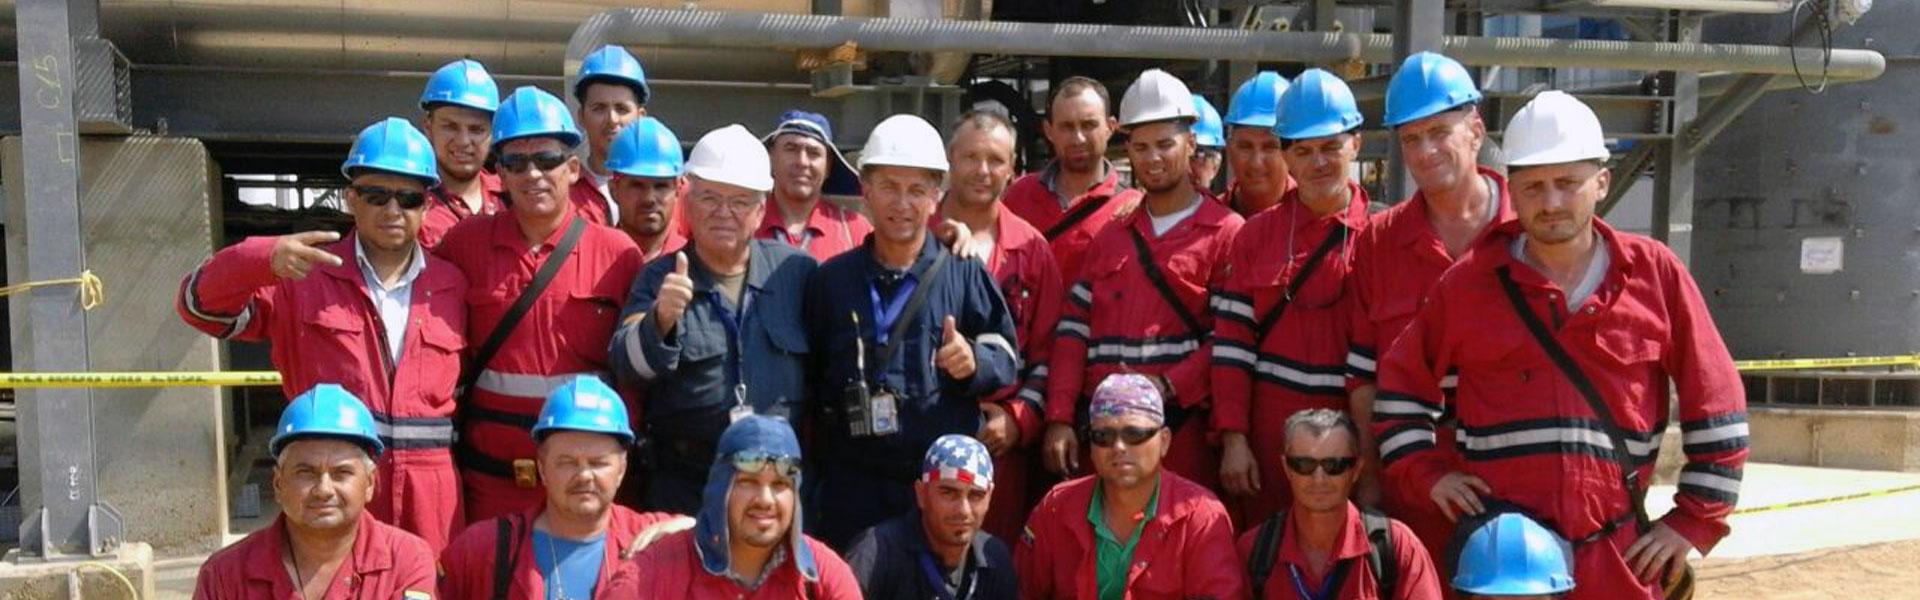 Accede - Industrial Construction Company